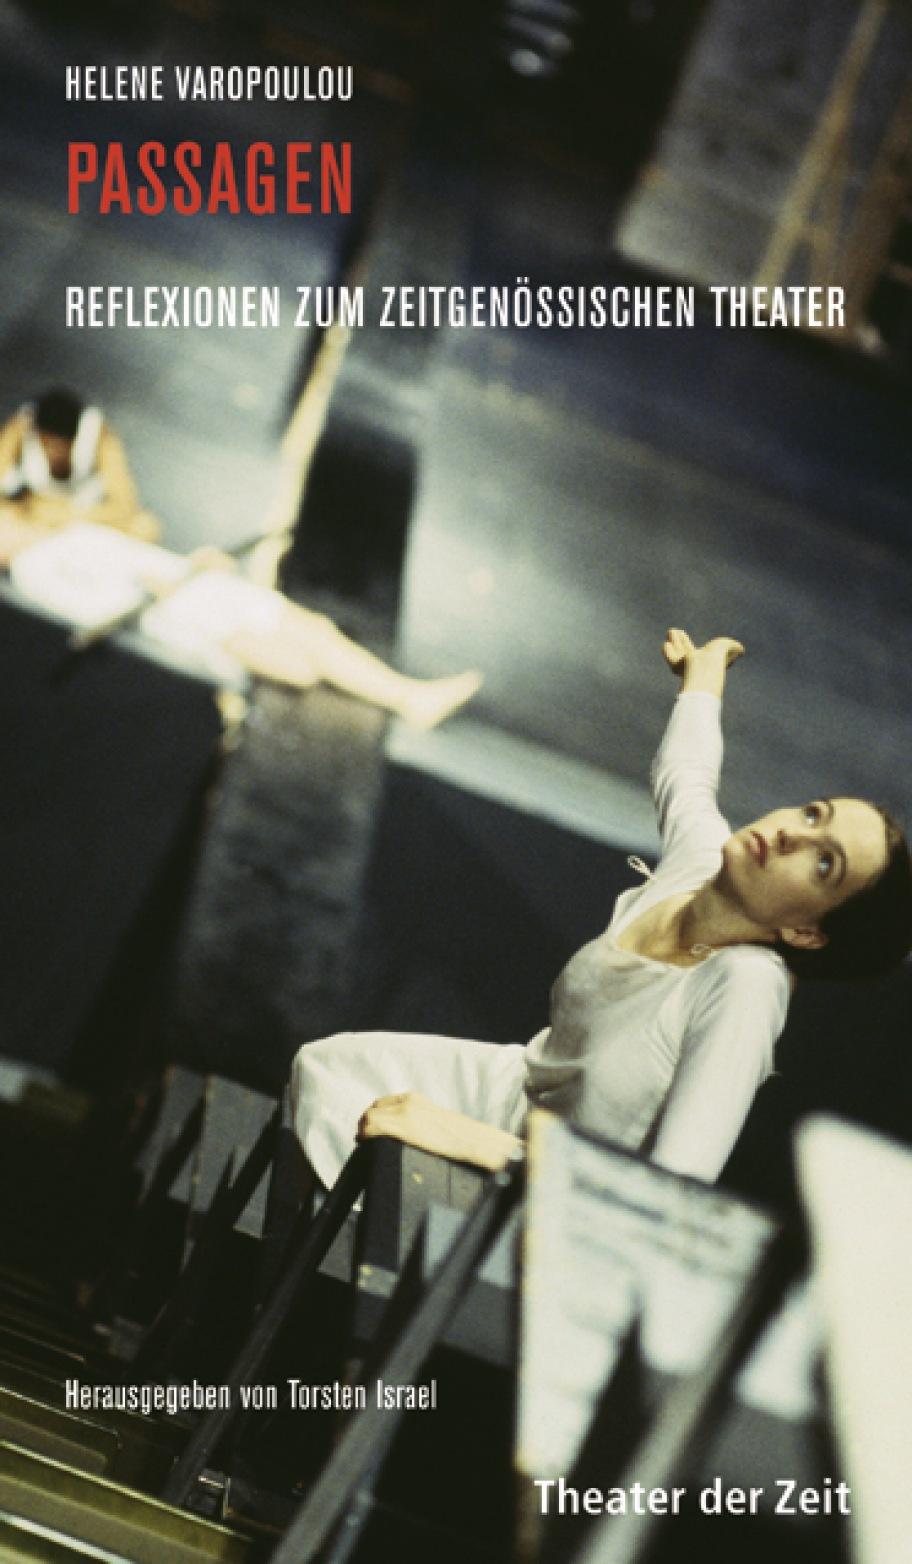 Helene Varopoulou: Passagen